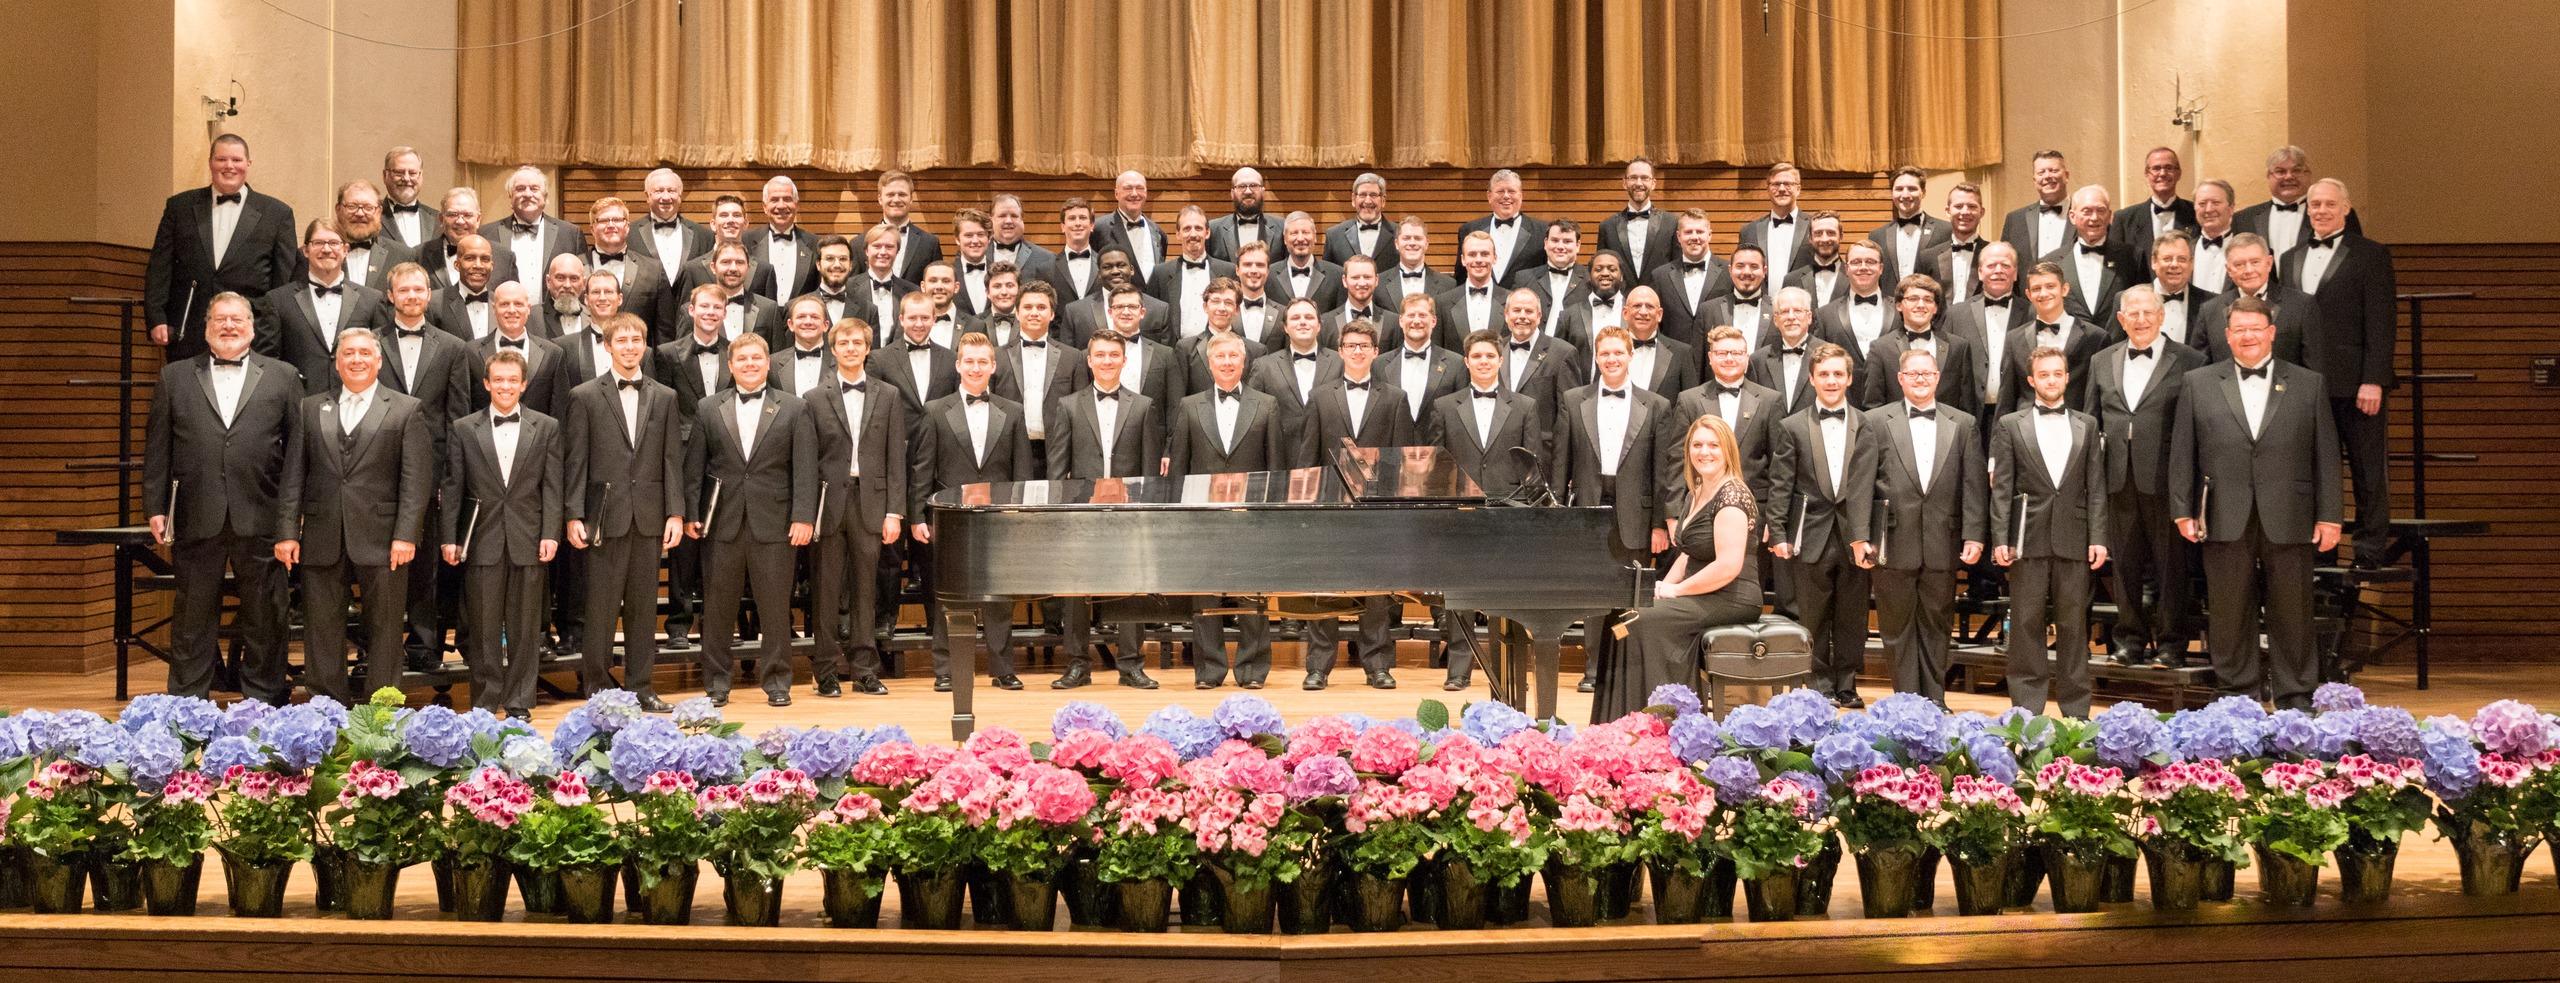 Baldwin Wallace University Men's Chorus at performance